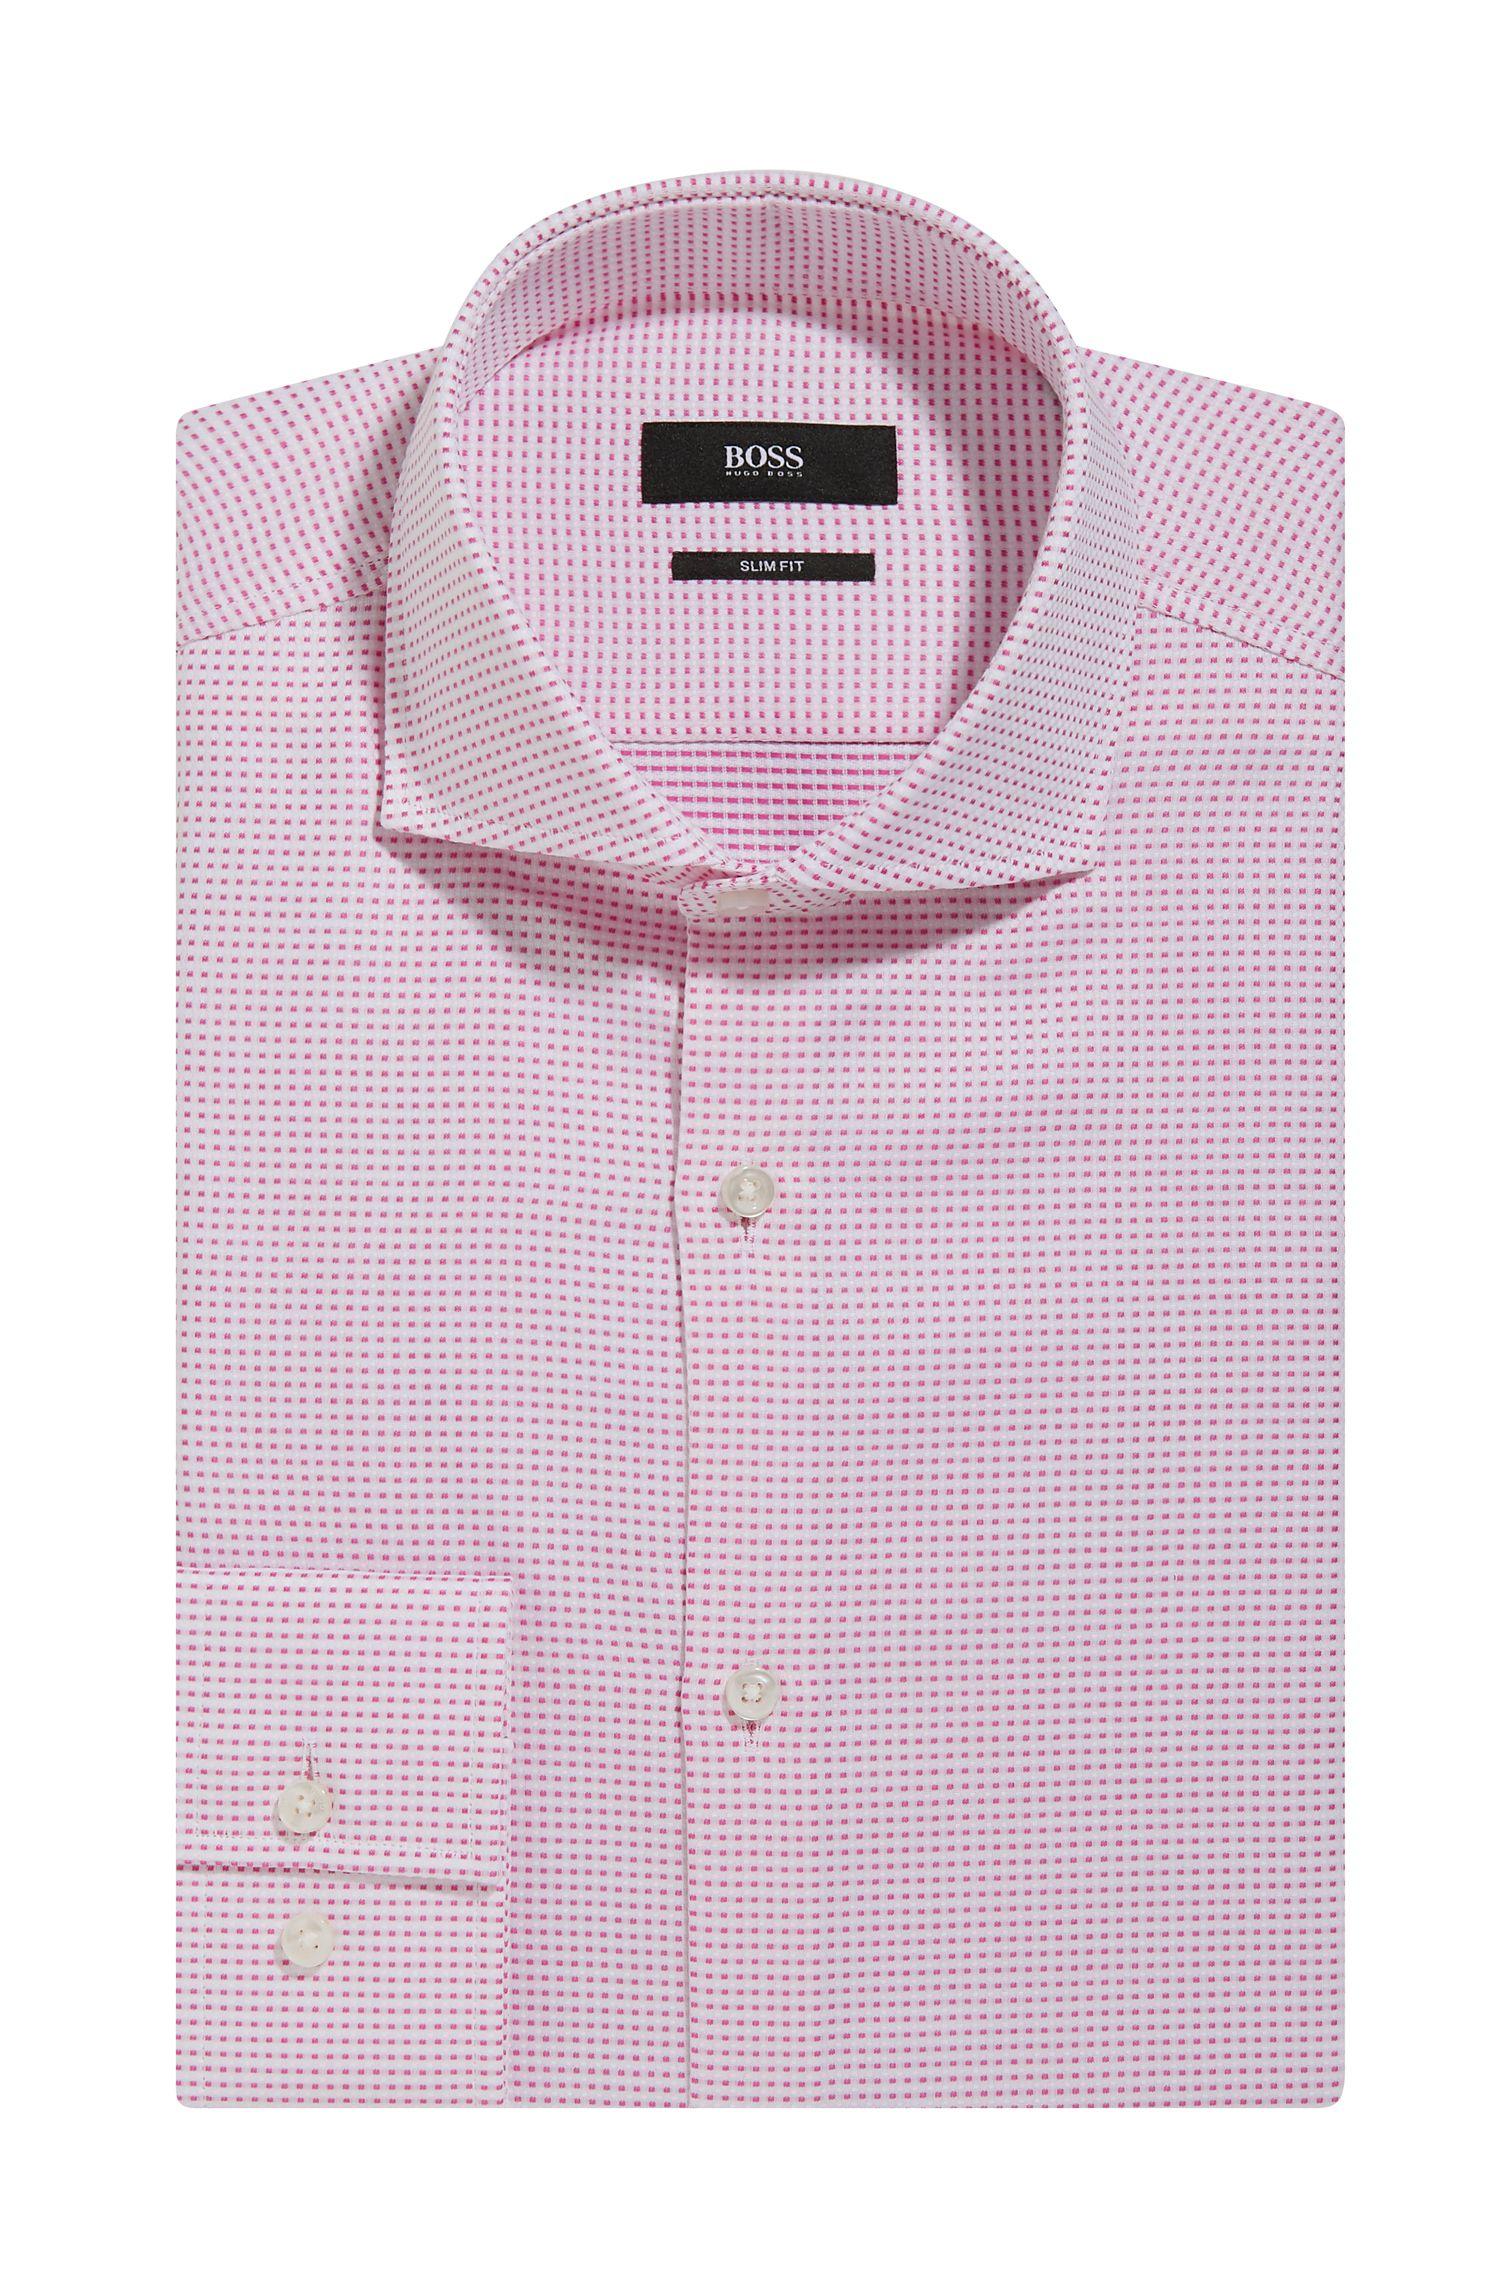 Micro-Square Cotton Dress Shirt, Slim Fit | Jason